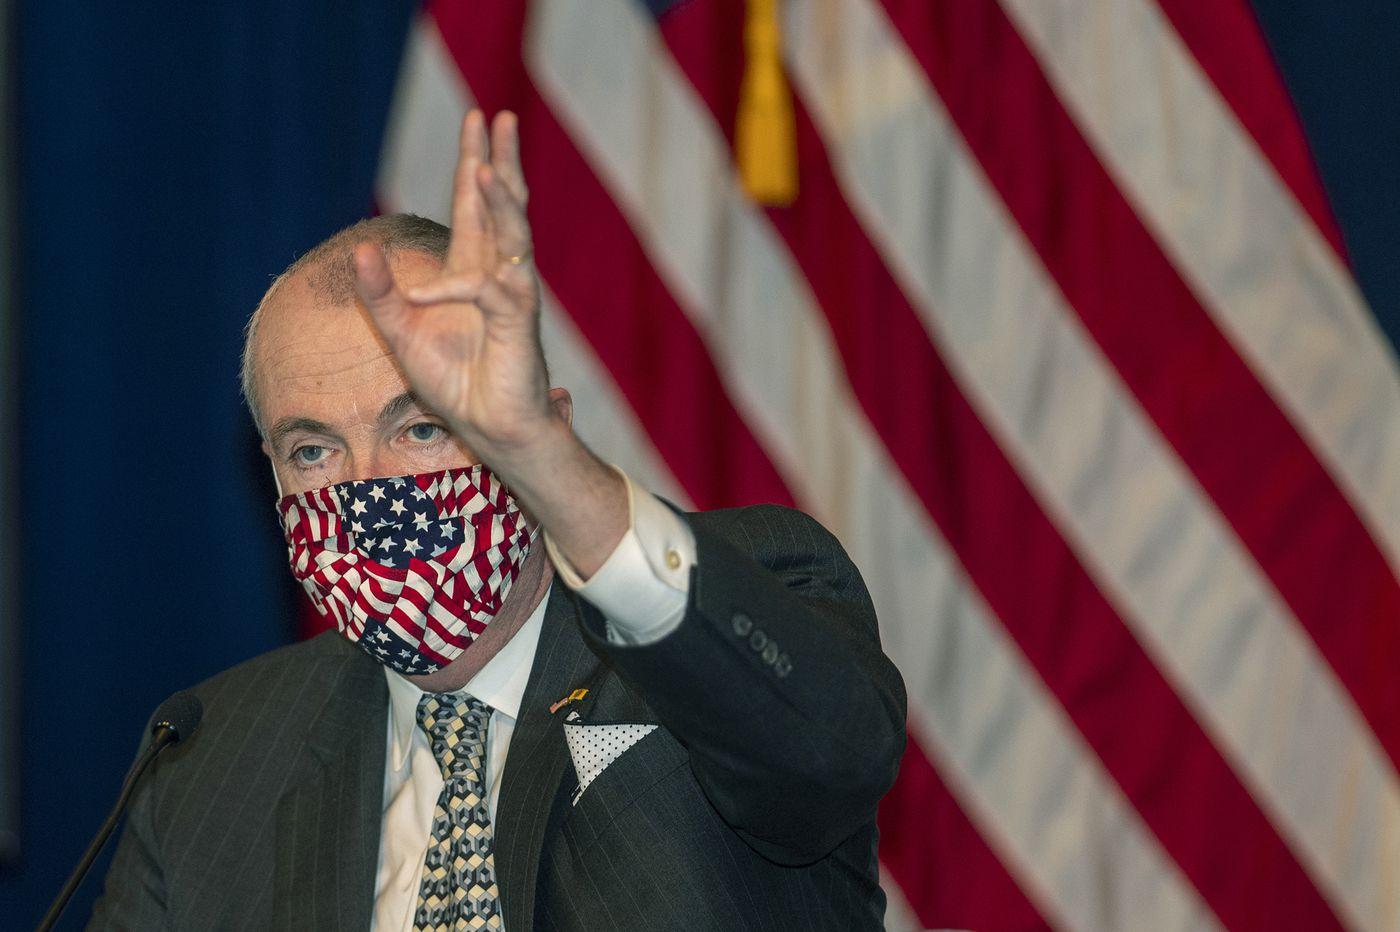 N.J. bills make Juneteenth a state holiday, abolish freeholder title